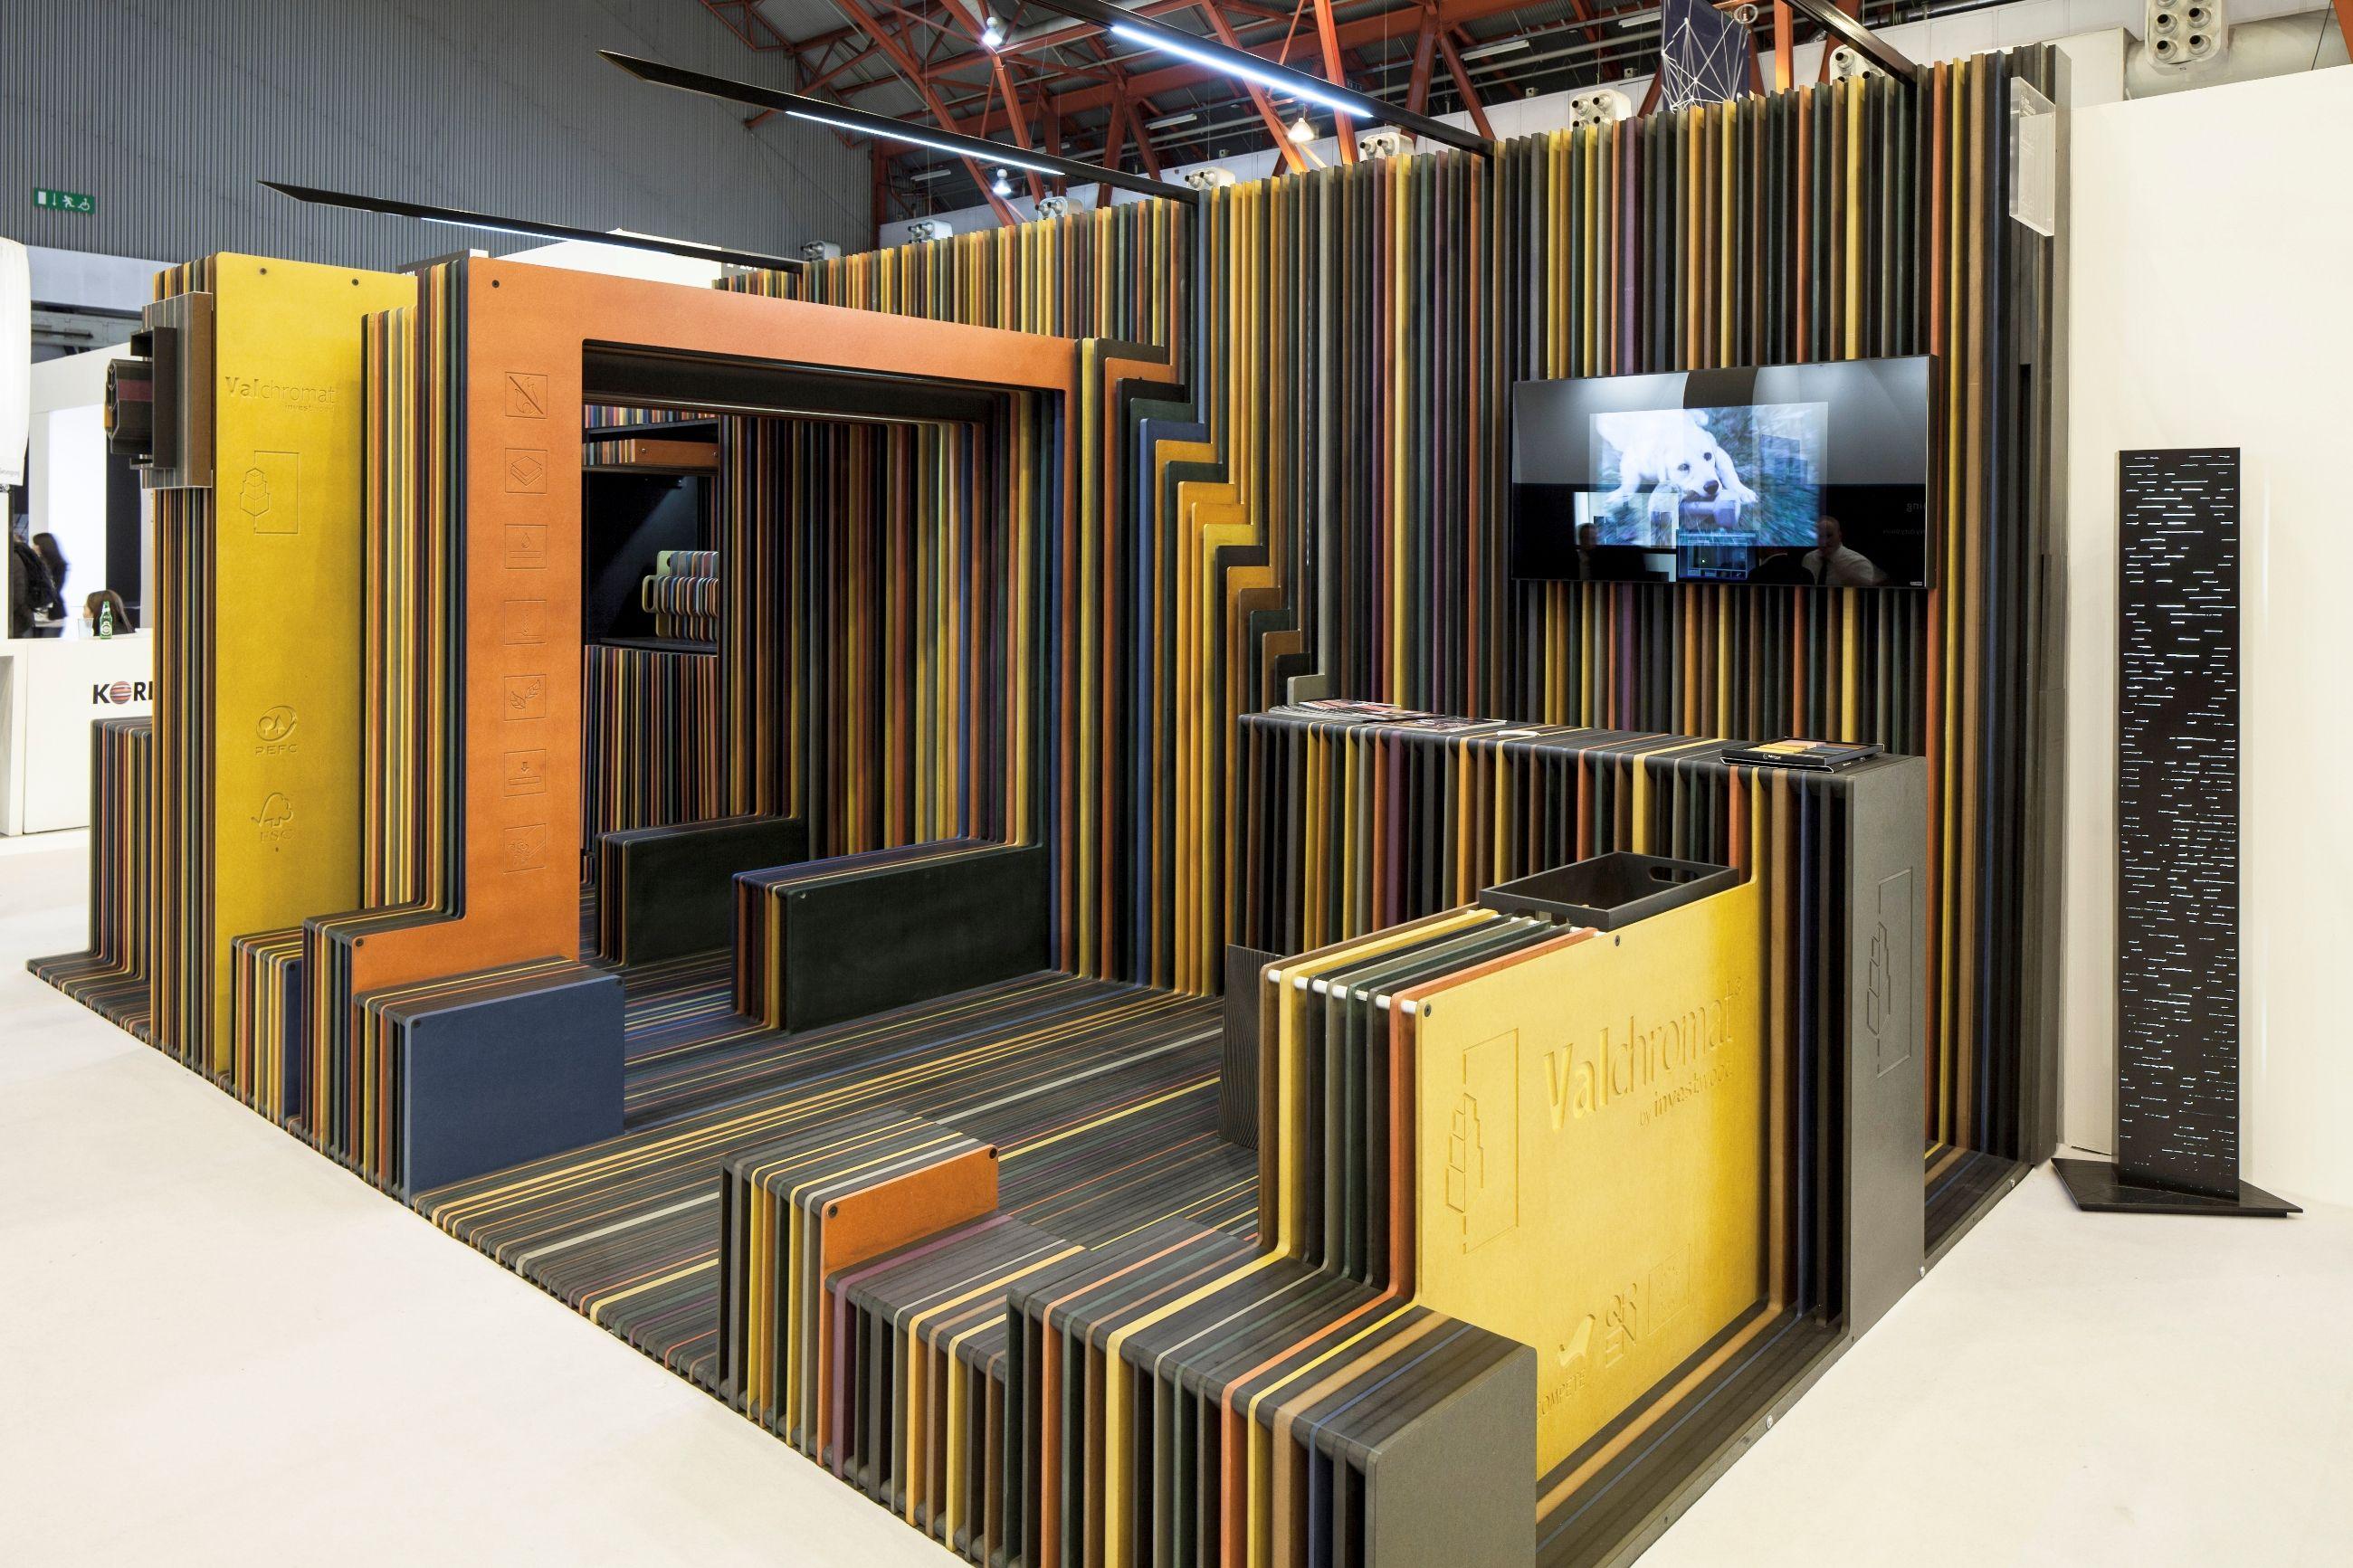 Valchromat Engineered Coloured Wood Avec Images Deco